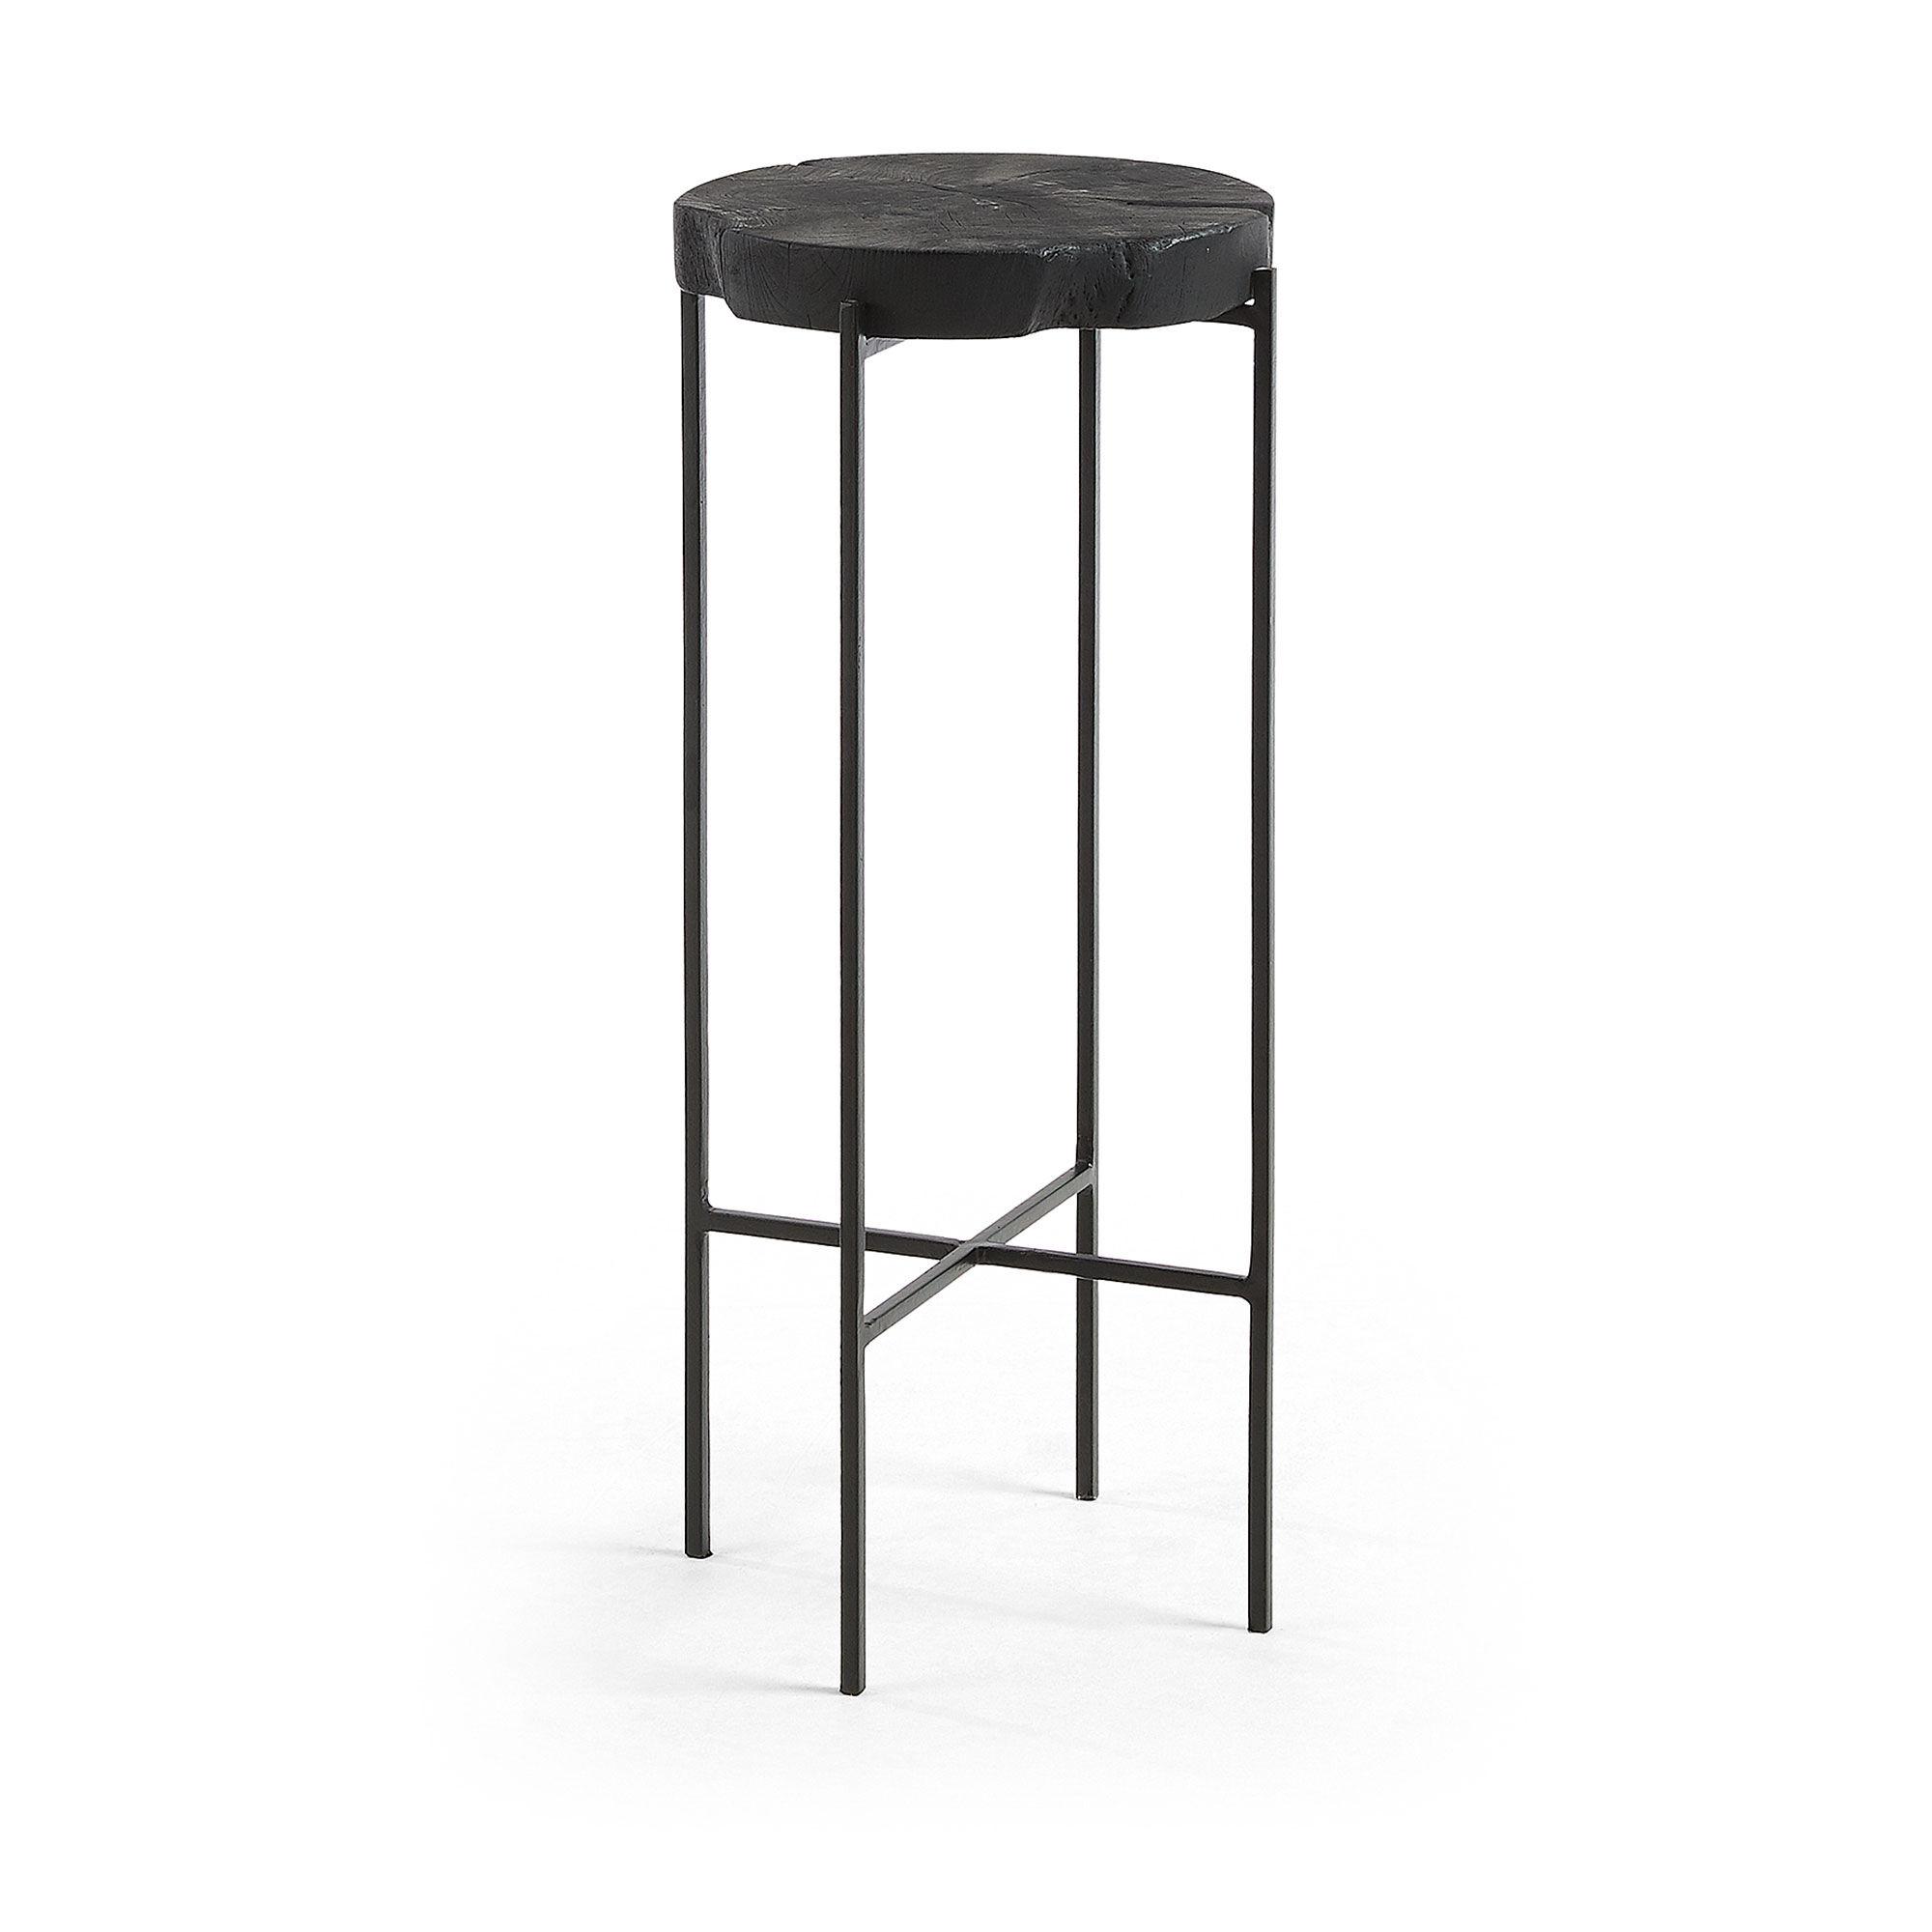 Kave Home Tavolino alto Existence altezza 70 cm